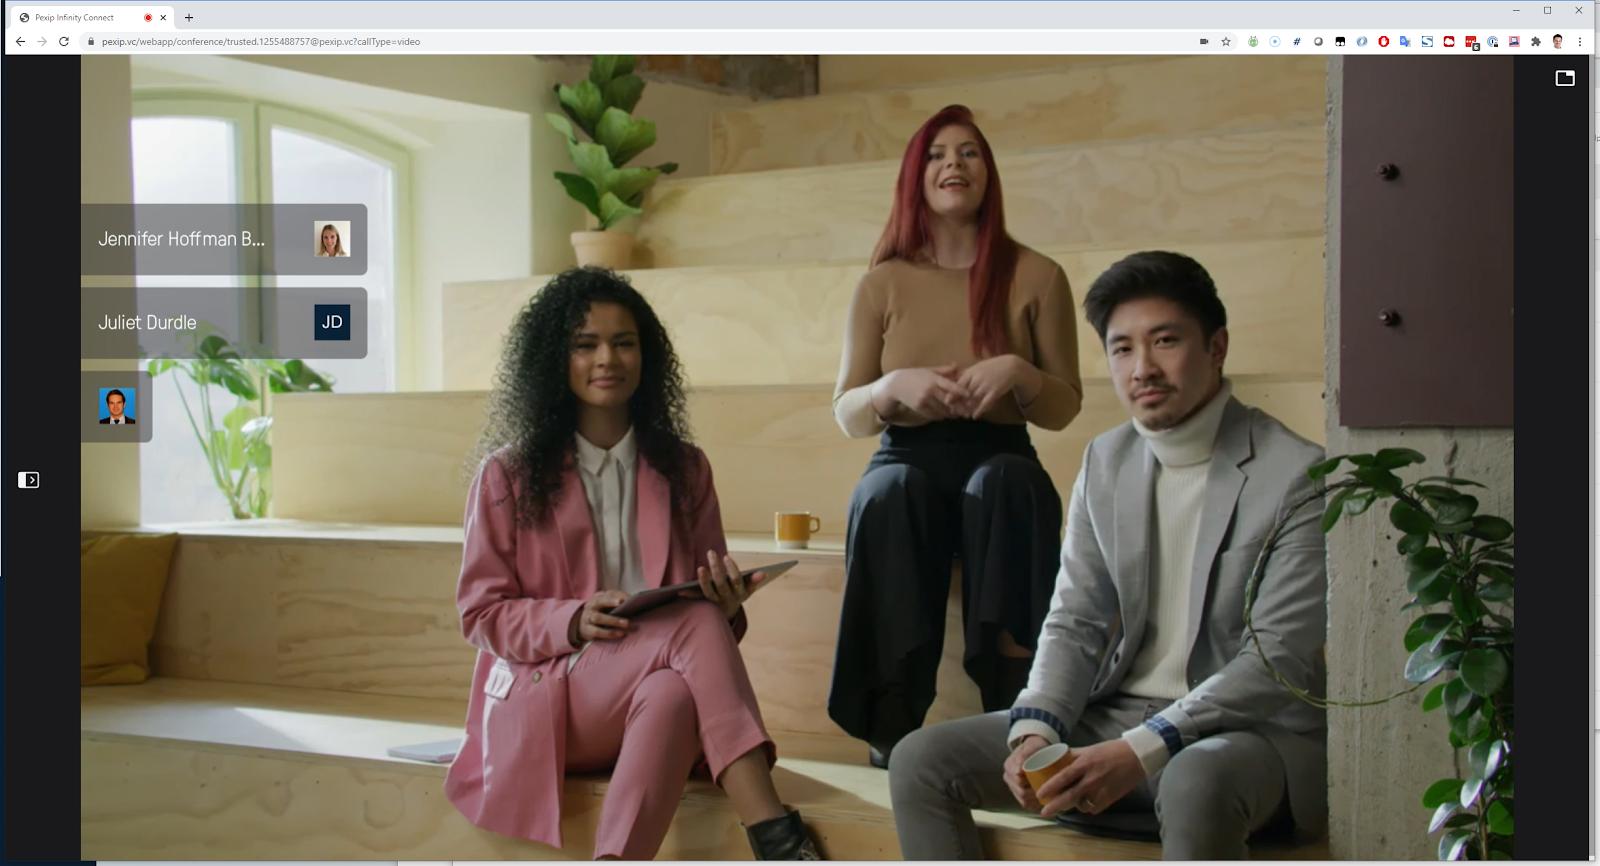 Microsoft avatars help